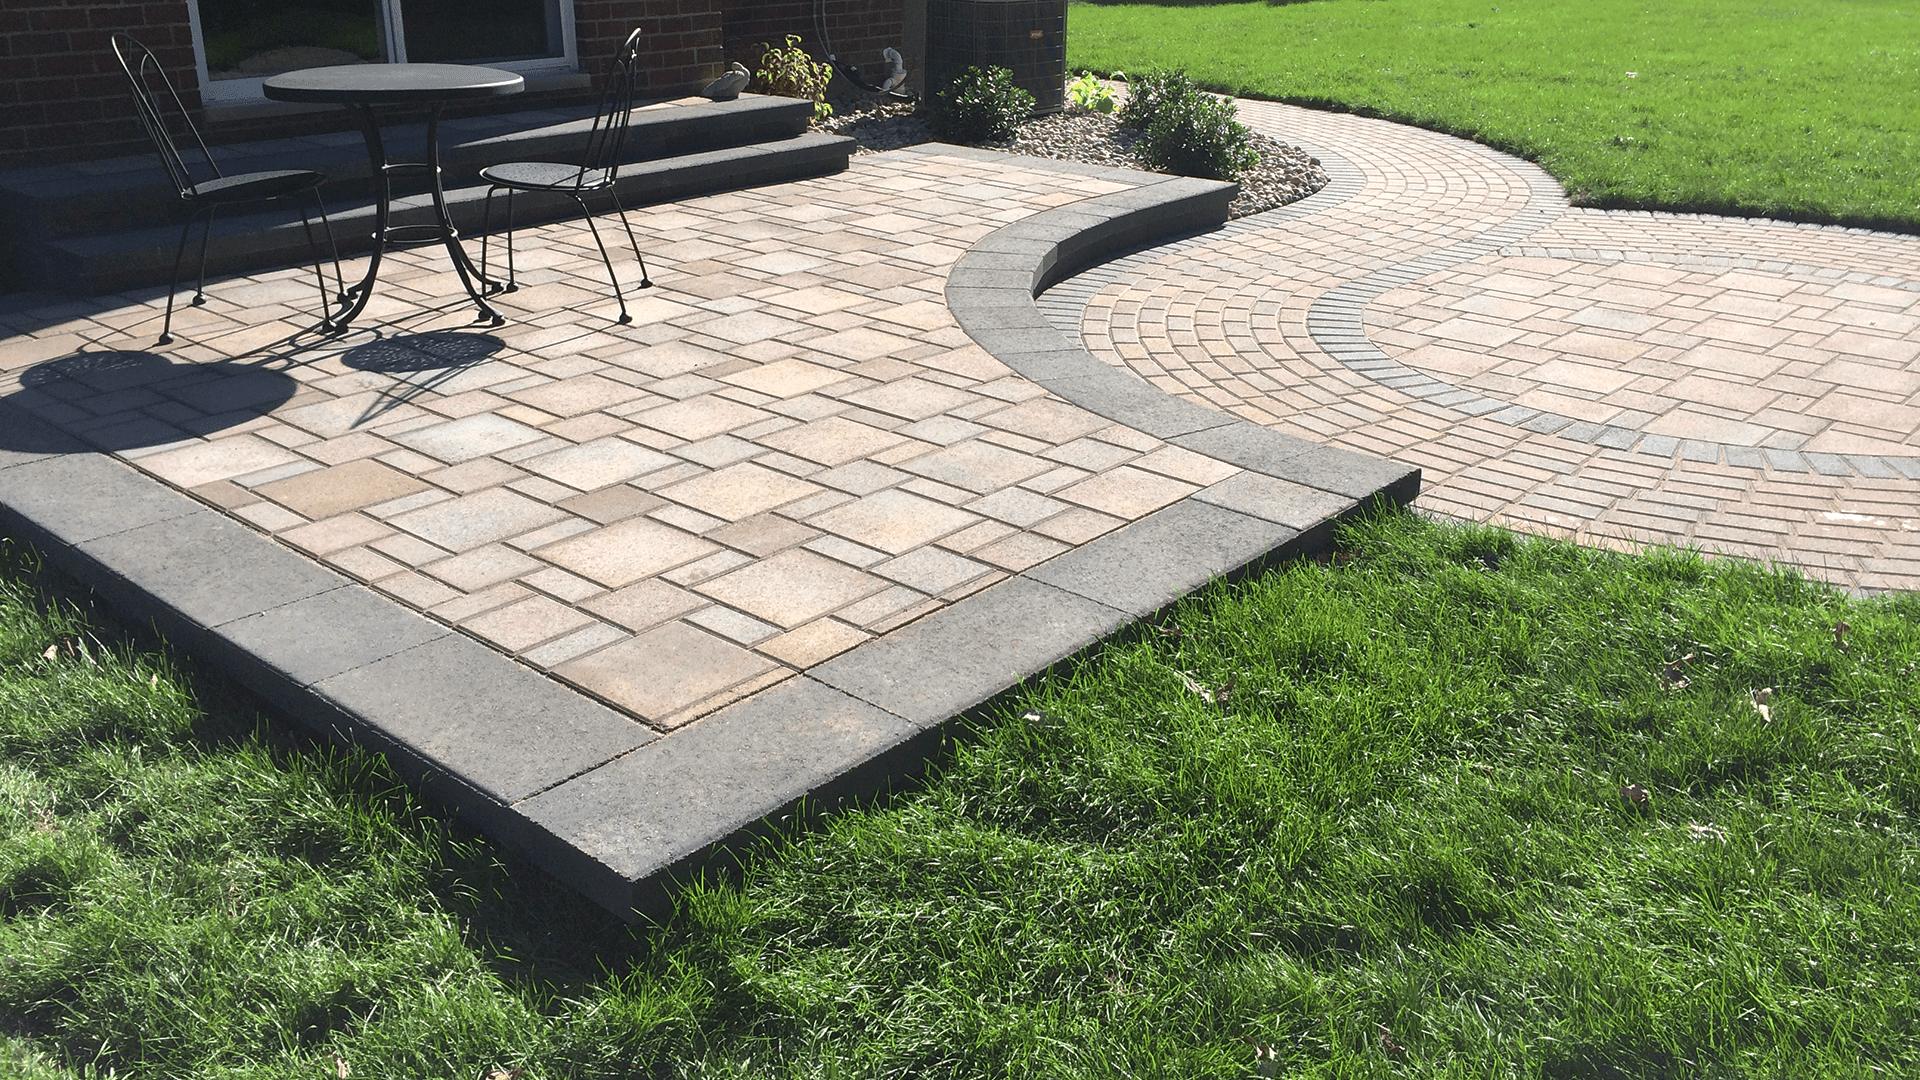 3 easy ways to install patio pavers